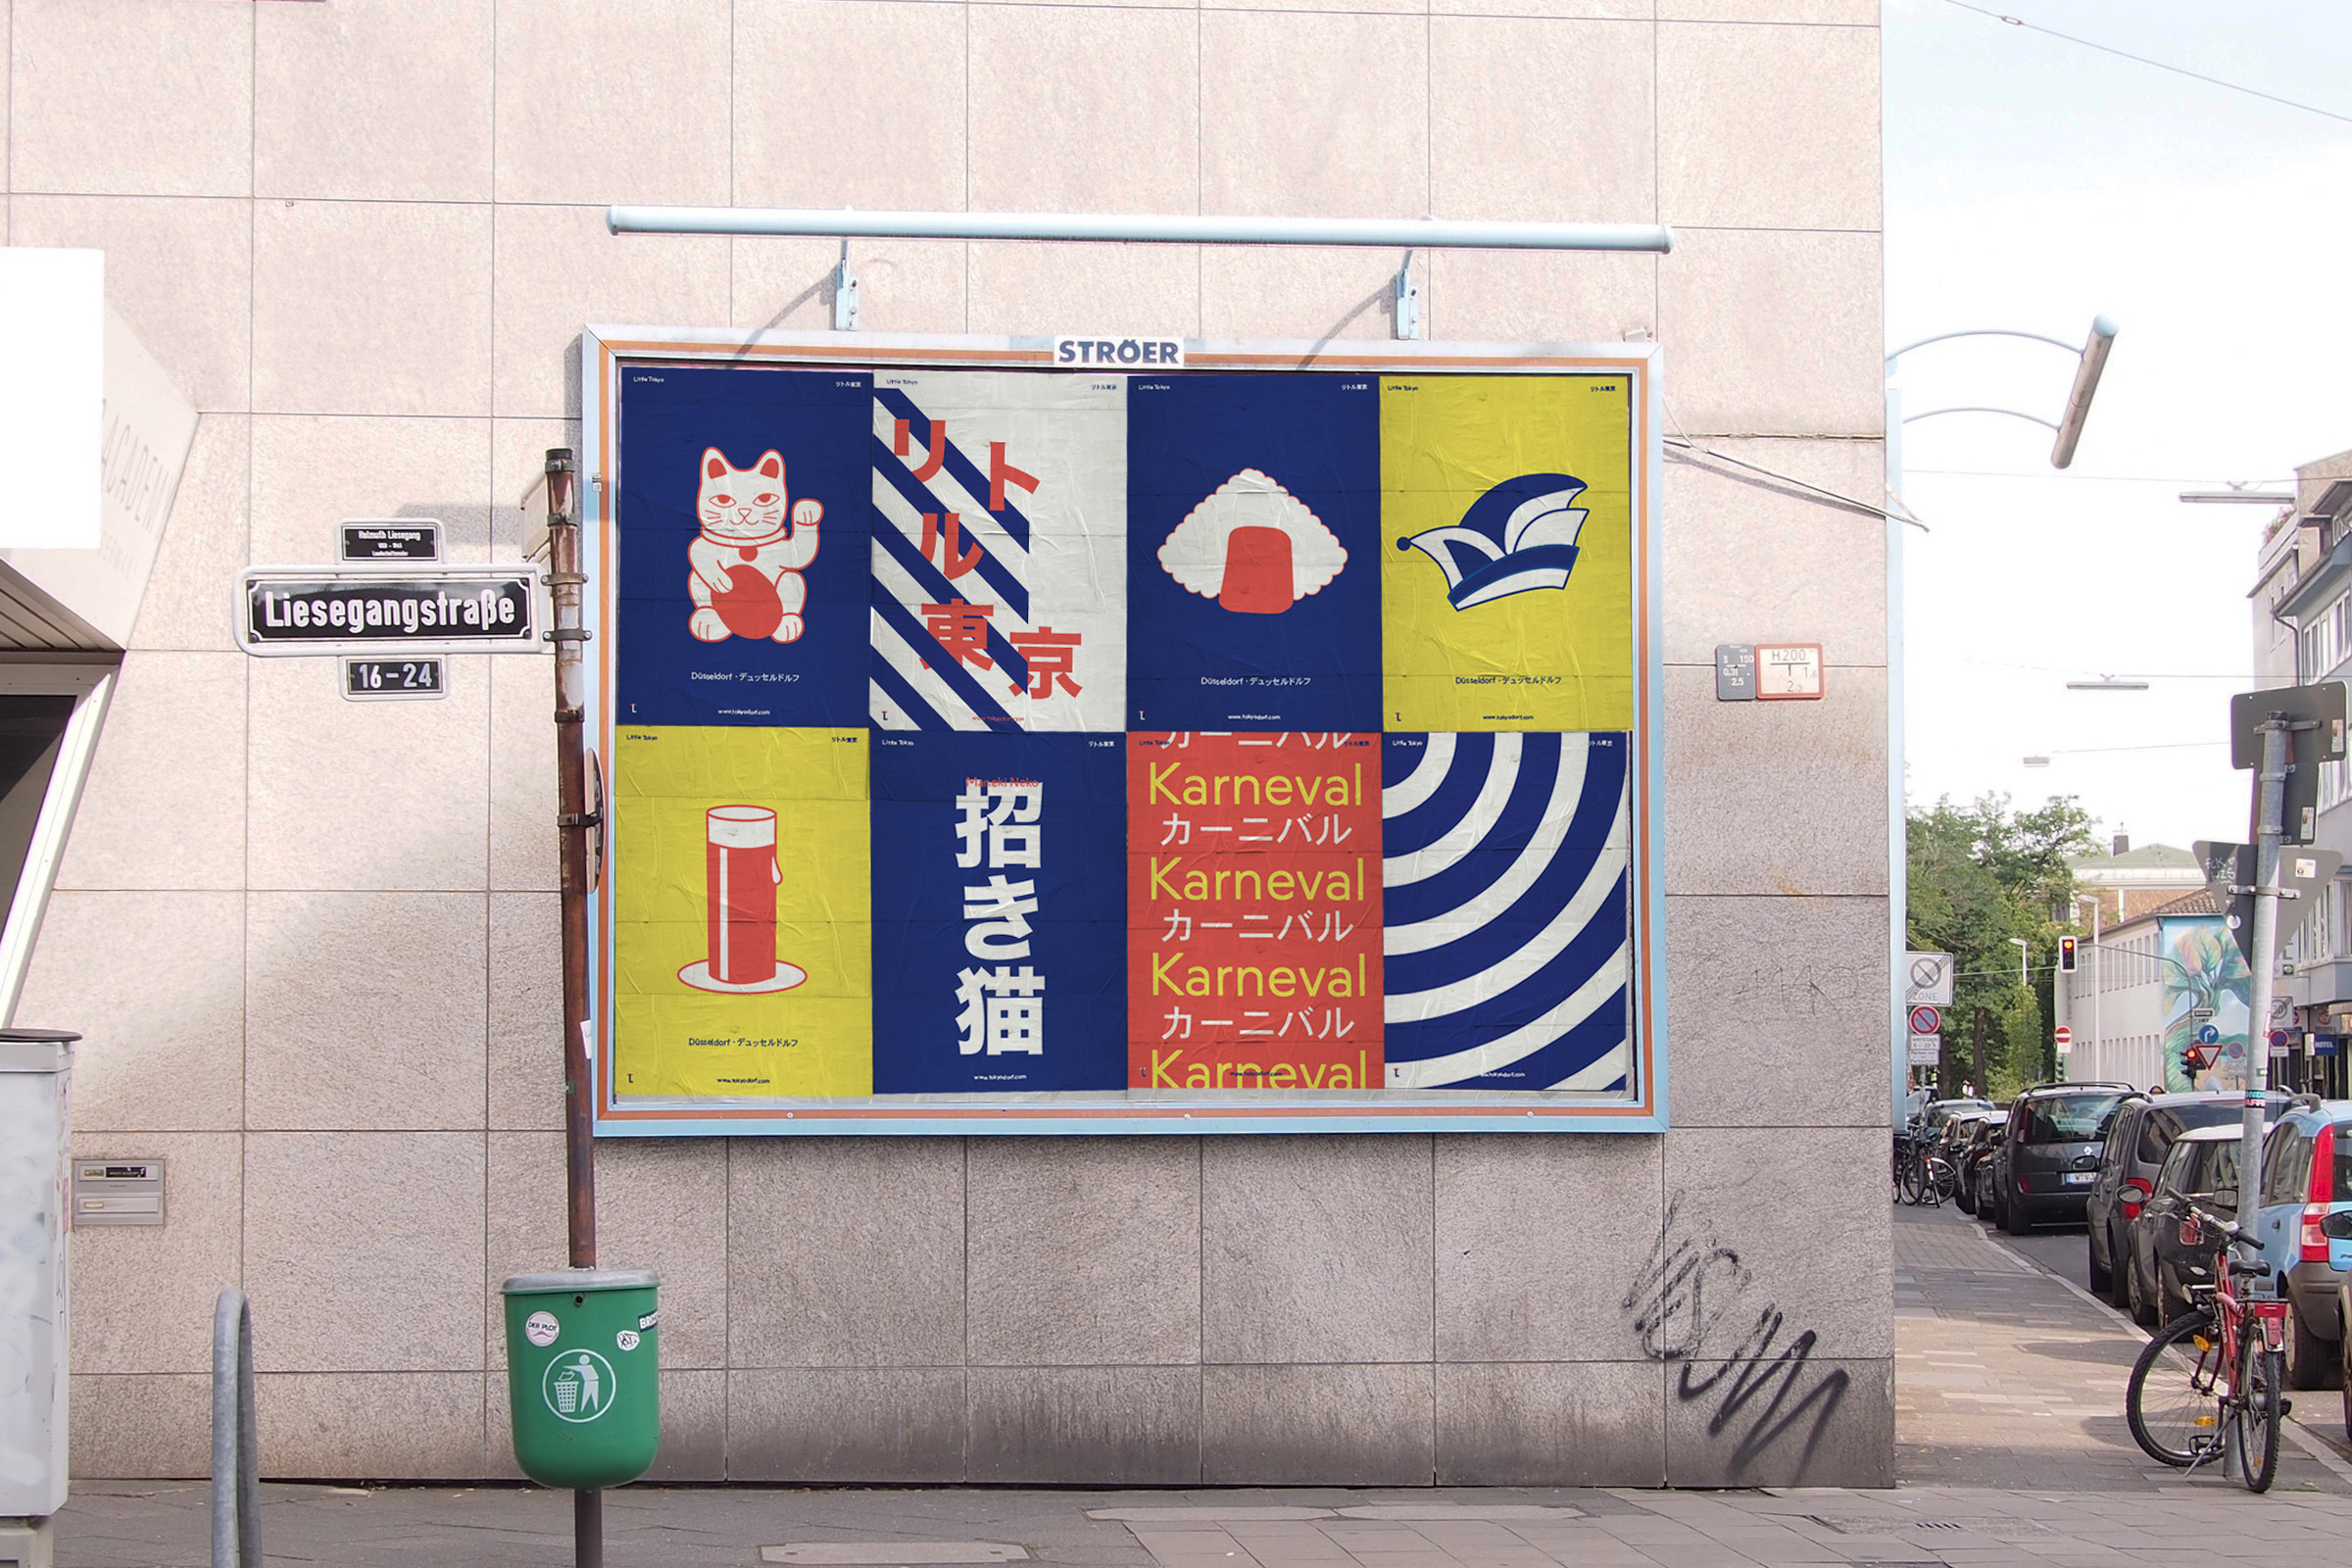 Werbeplakat, Little Tokyo, Düsseldorf, Altstadt, Winkekatze